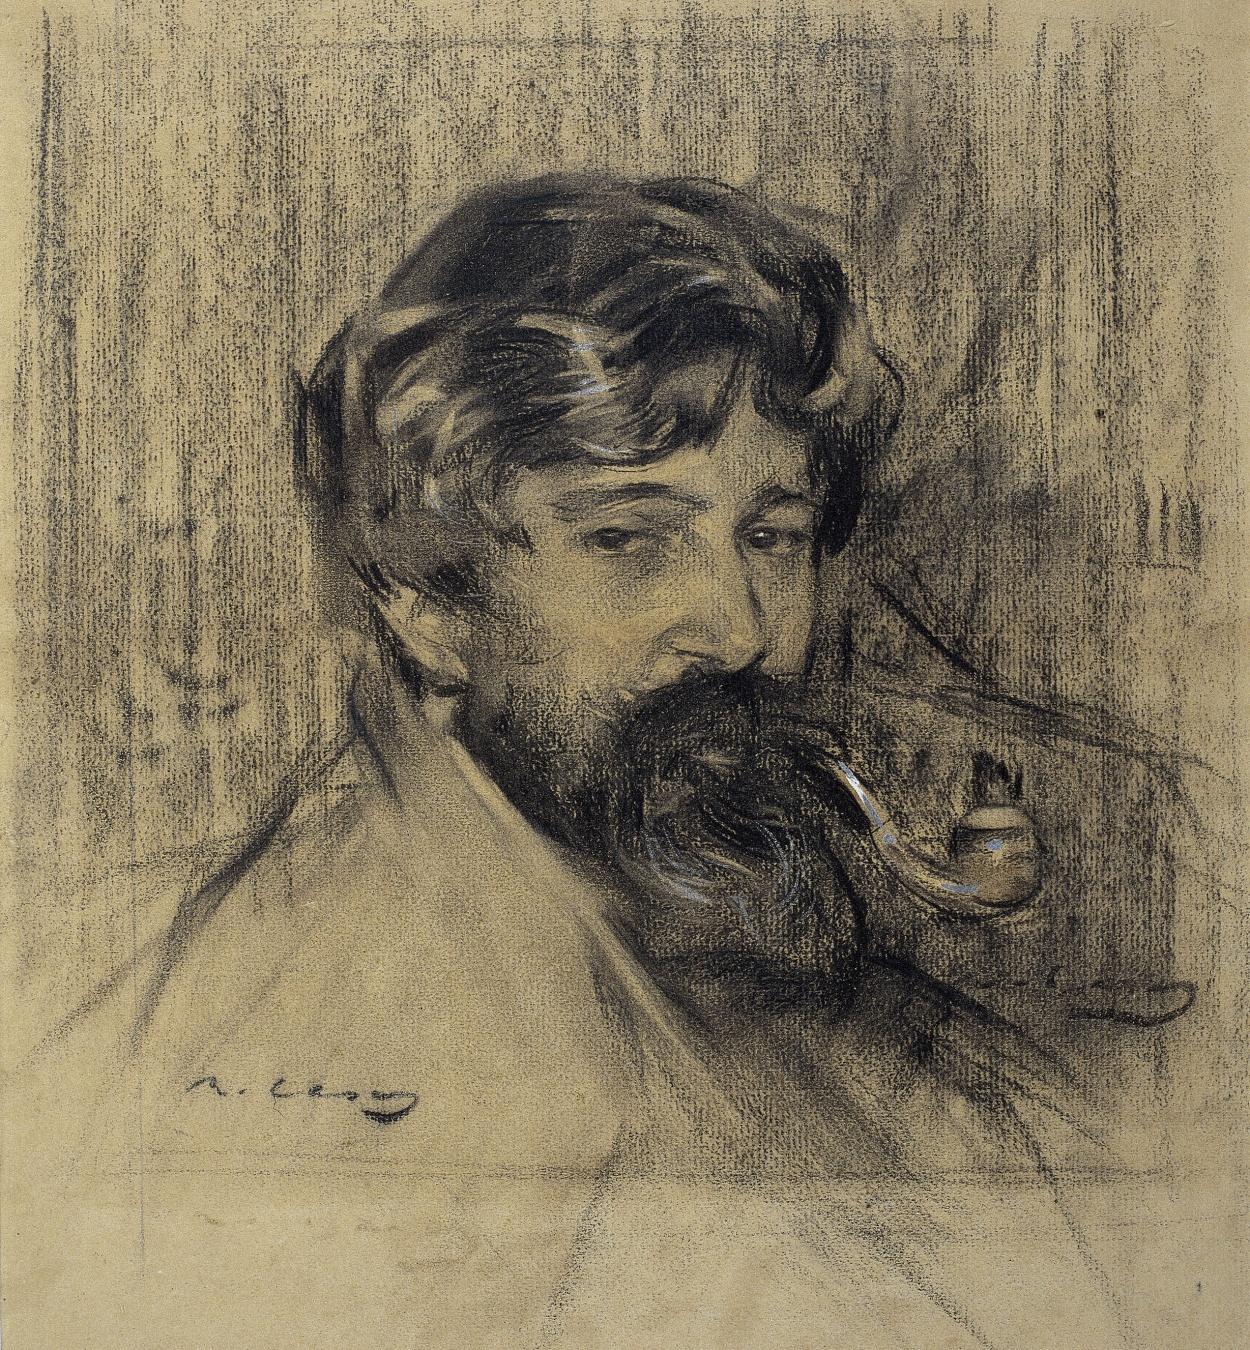 Ramon Casas - Retrato de Santiago Rusiñol - Hacia 1900